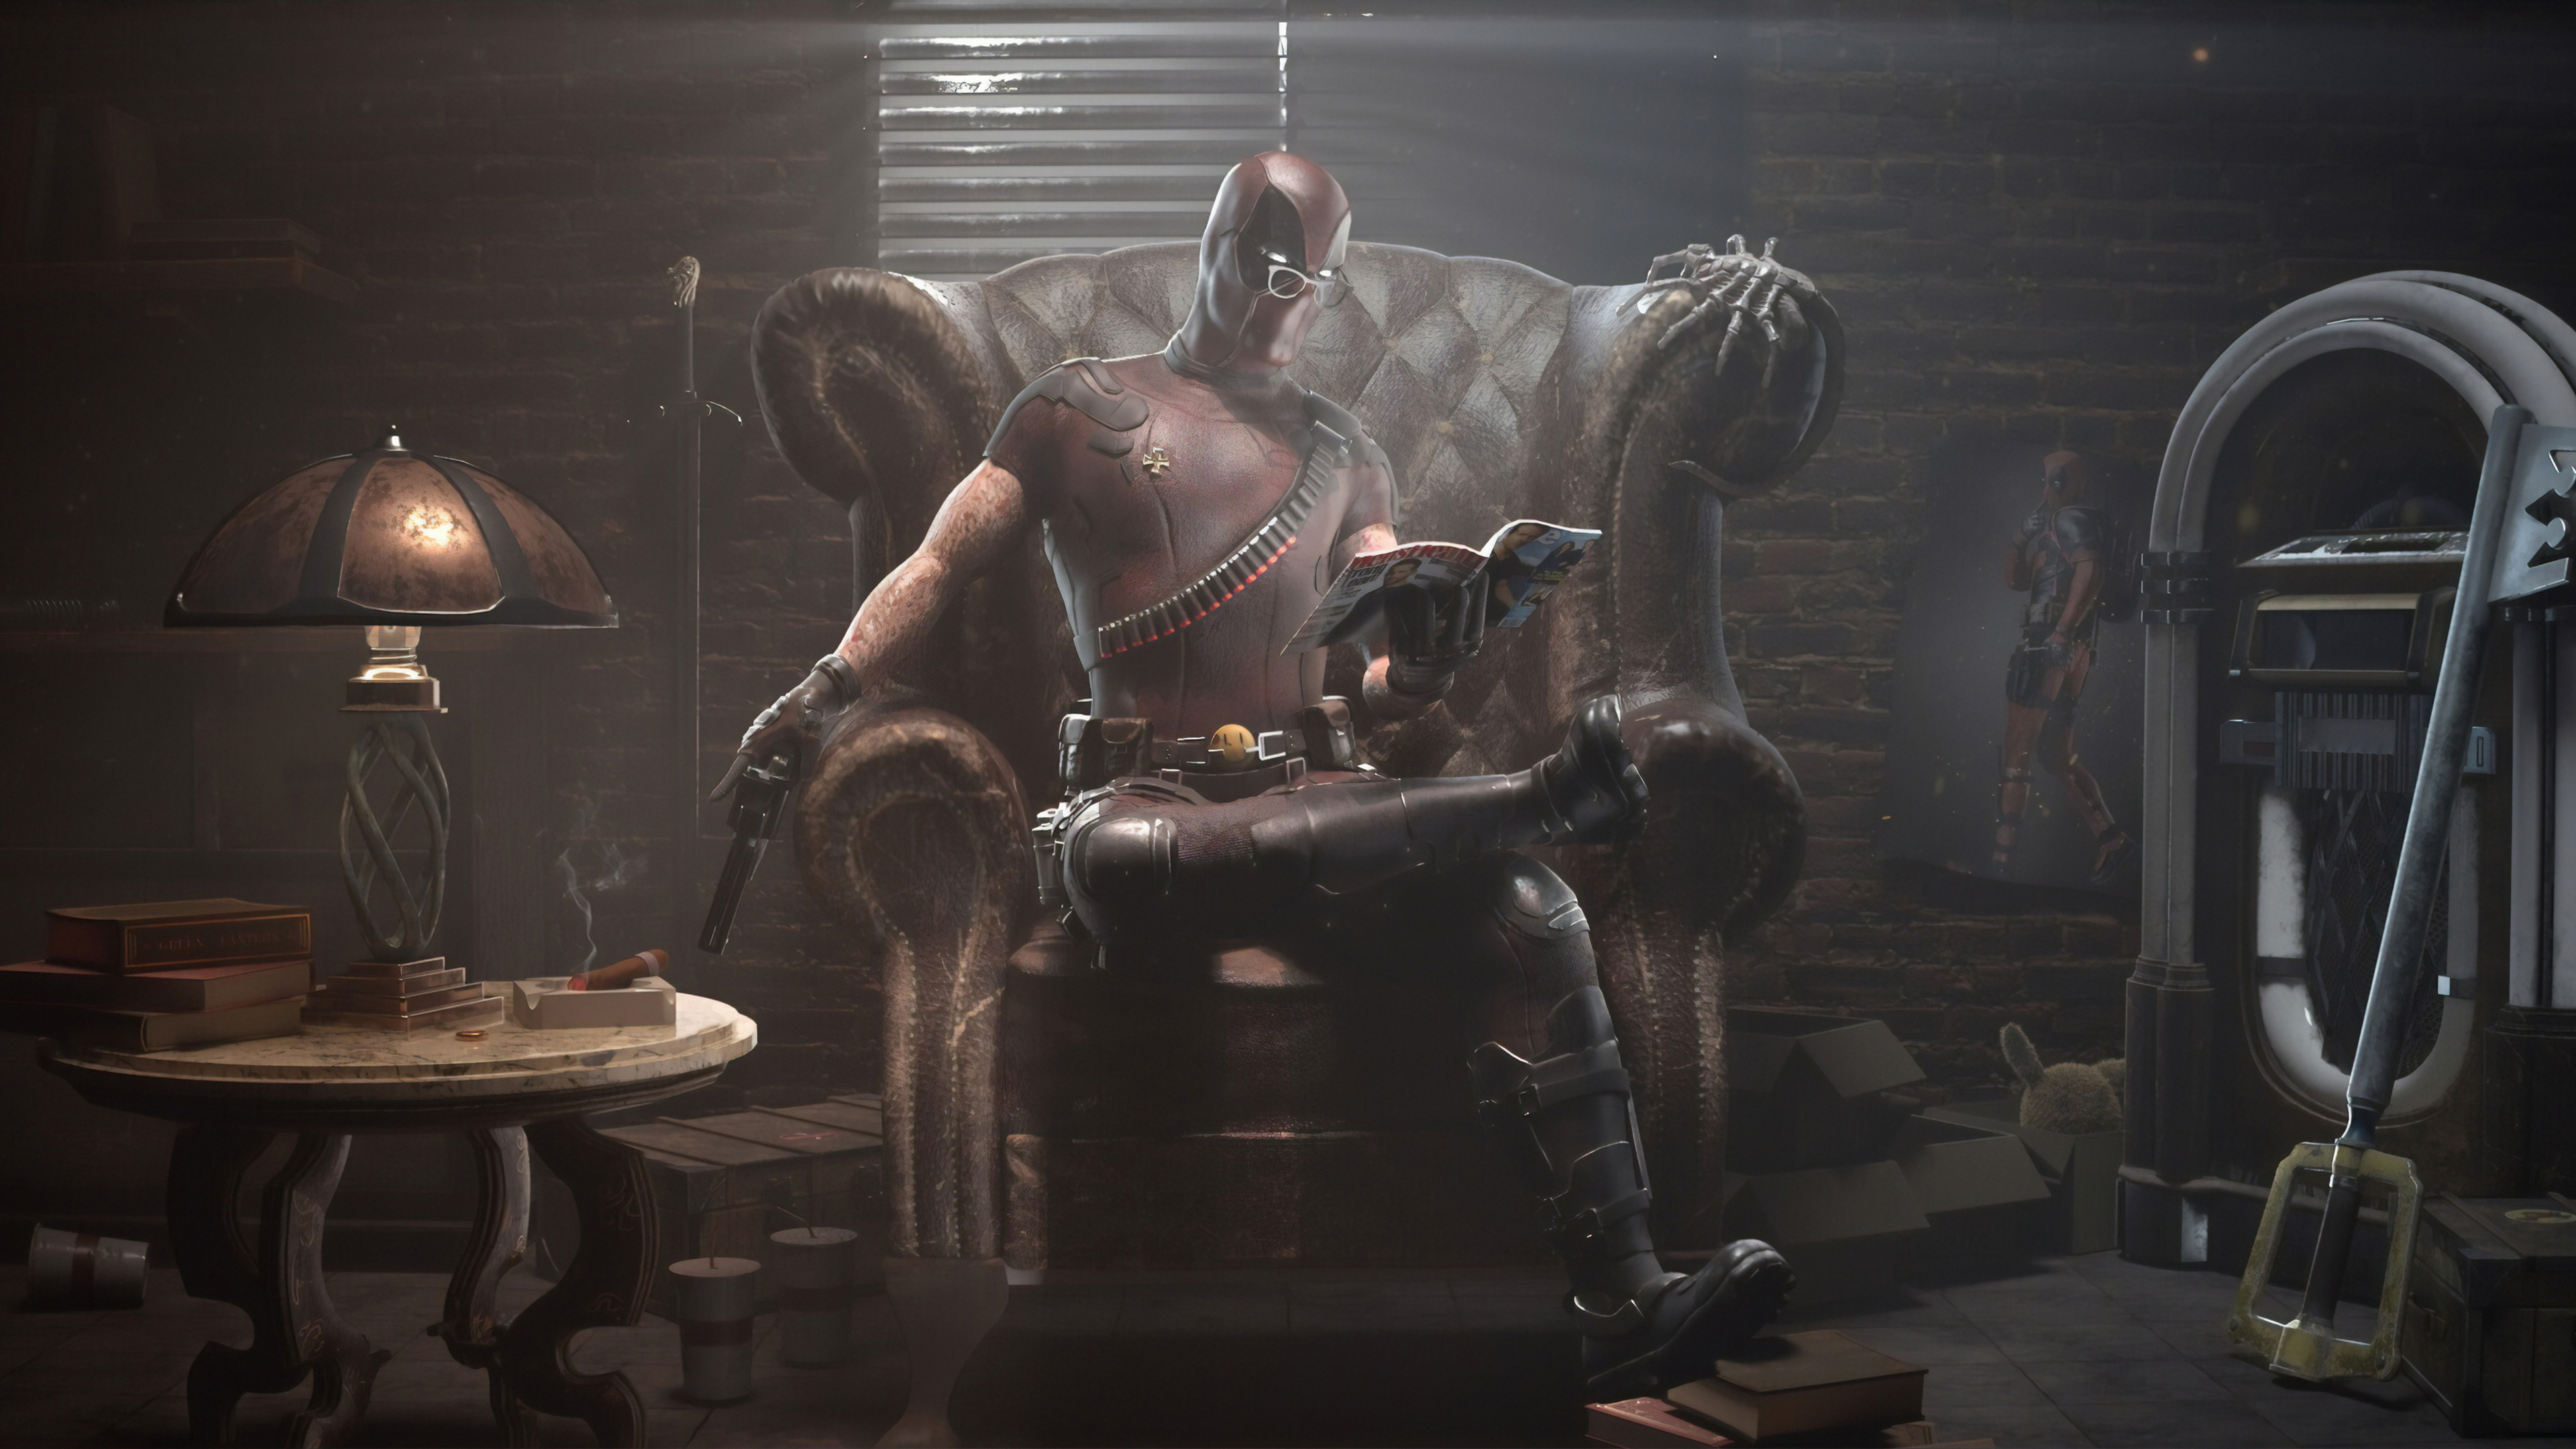 deadpool reading book and guns 1570918472 - Deadpool Reading Book And Guns - superheroes wallpapers, hd-wallpapers, digital art wallpapers, deadpool wallpapers, artwork wallpapers, artstation wallpapers, 4k-wallpapers